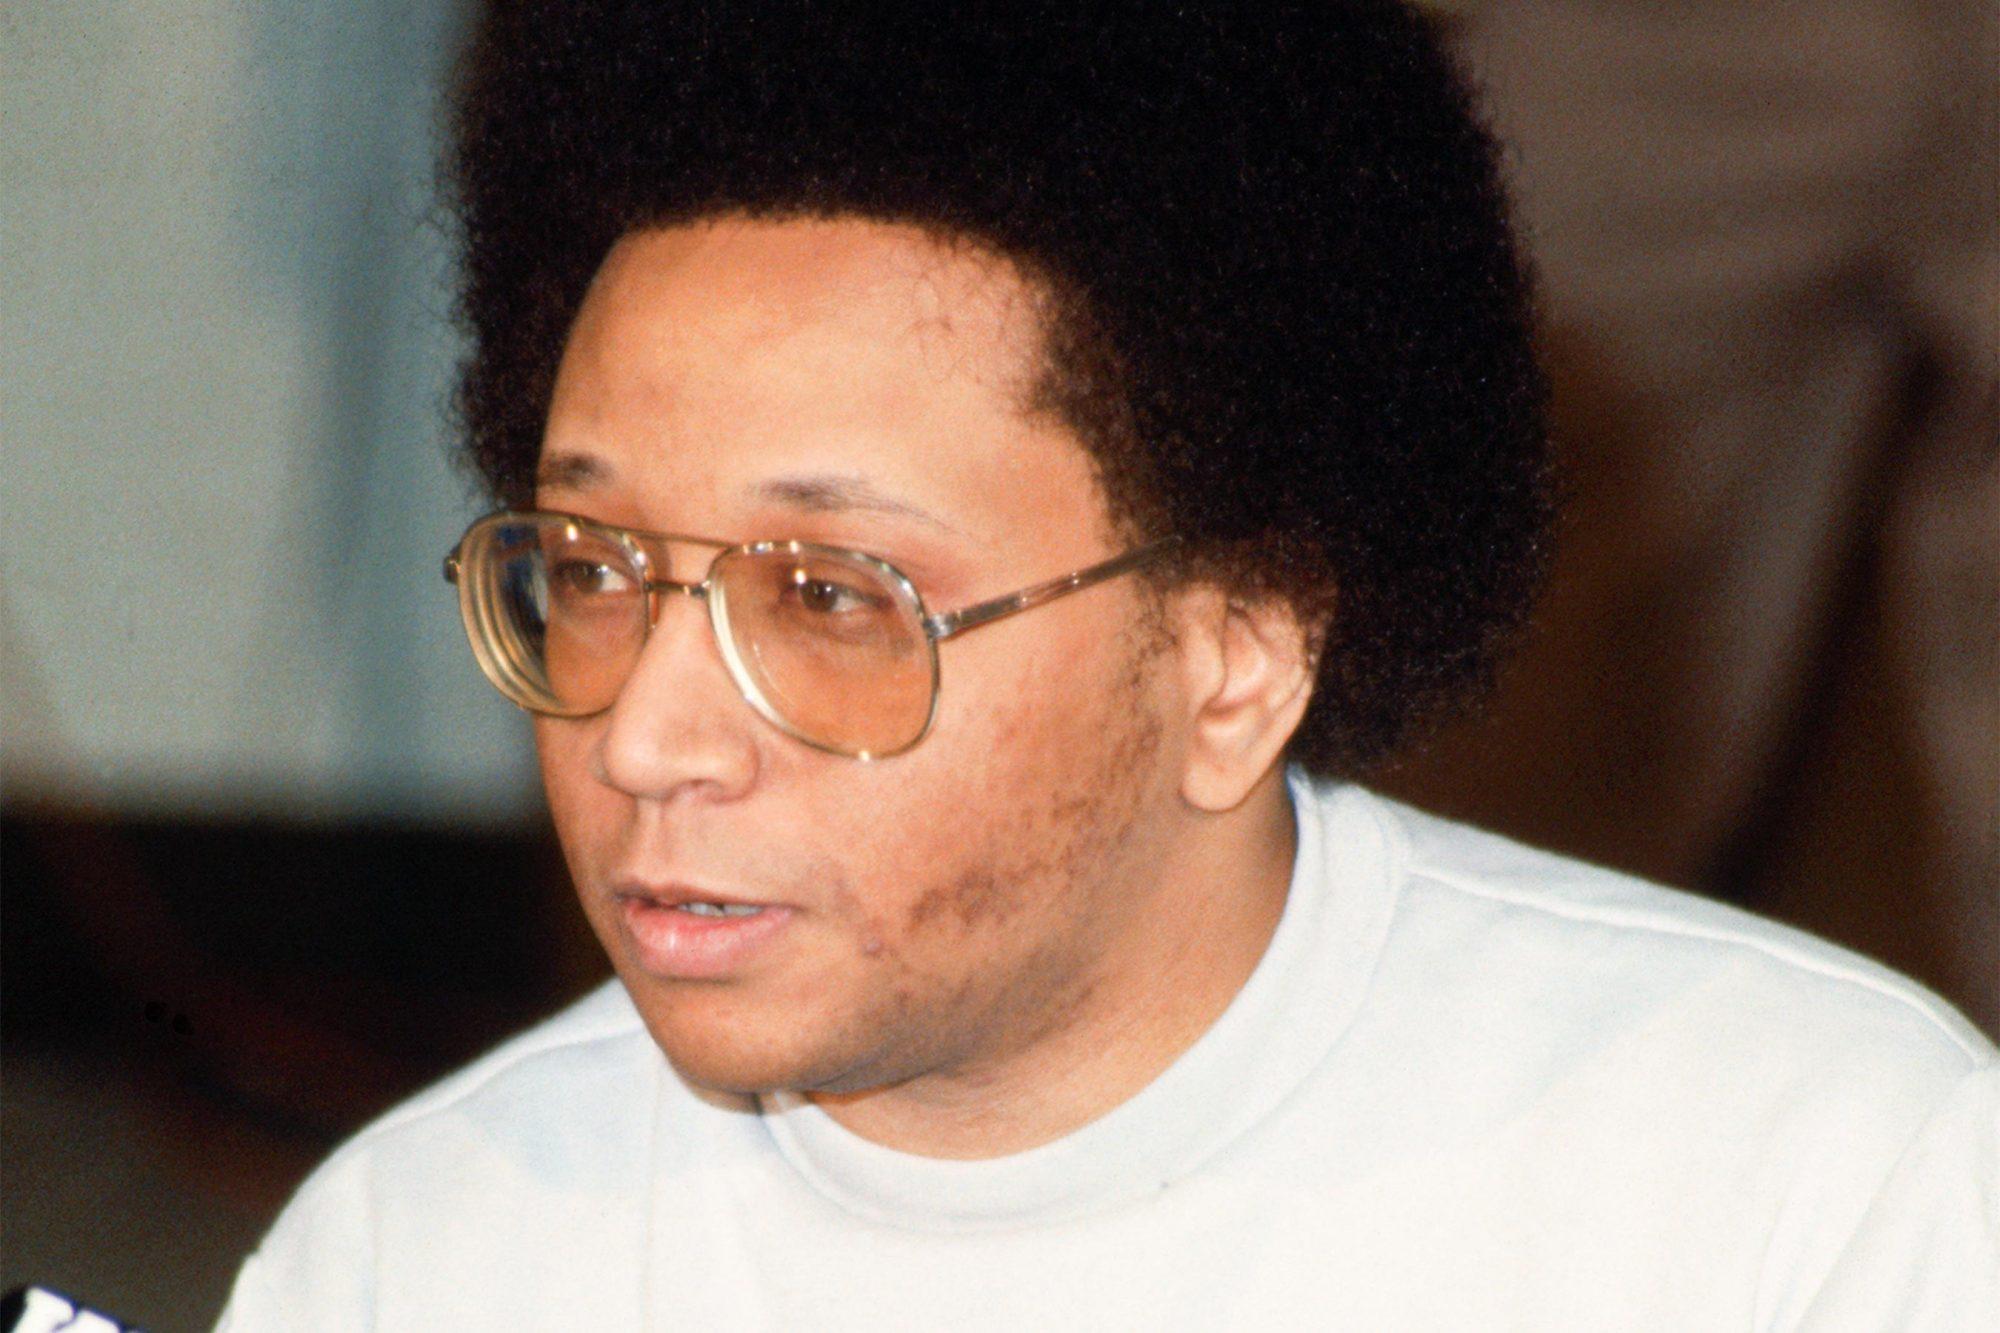 (Original Caption) Georgia: Close up of Wayne Williams, the convicted Atlanta child killer, giving a news conference at the Fulton County jail.